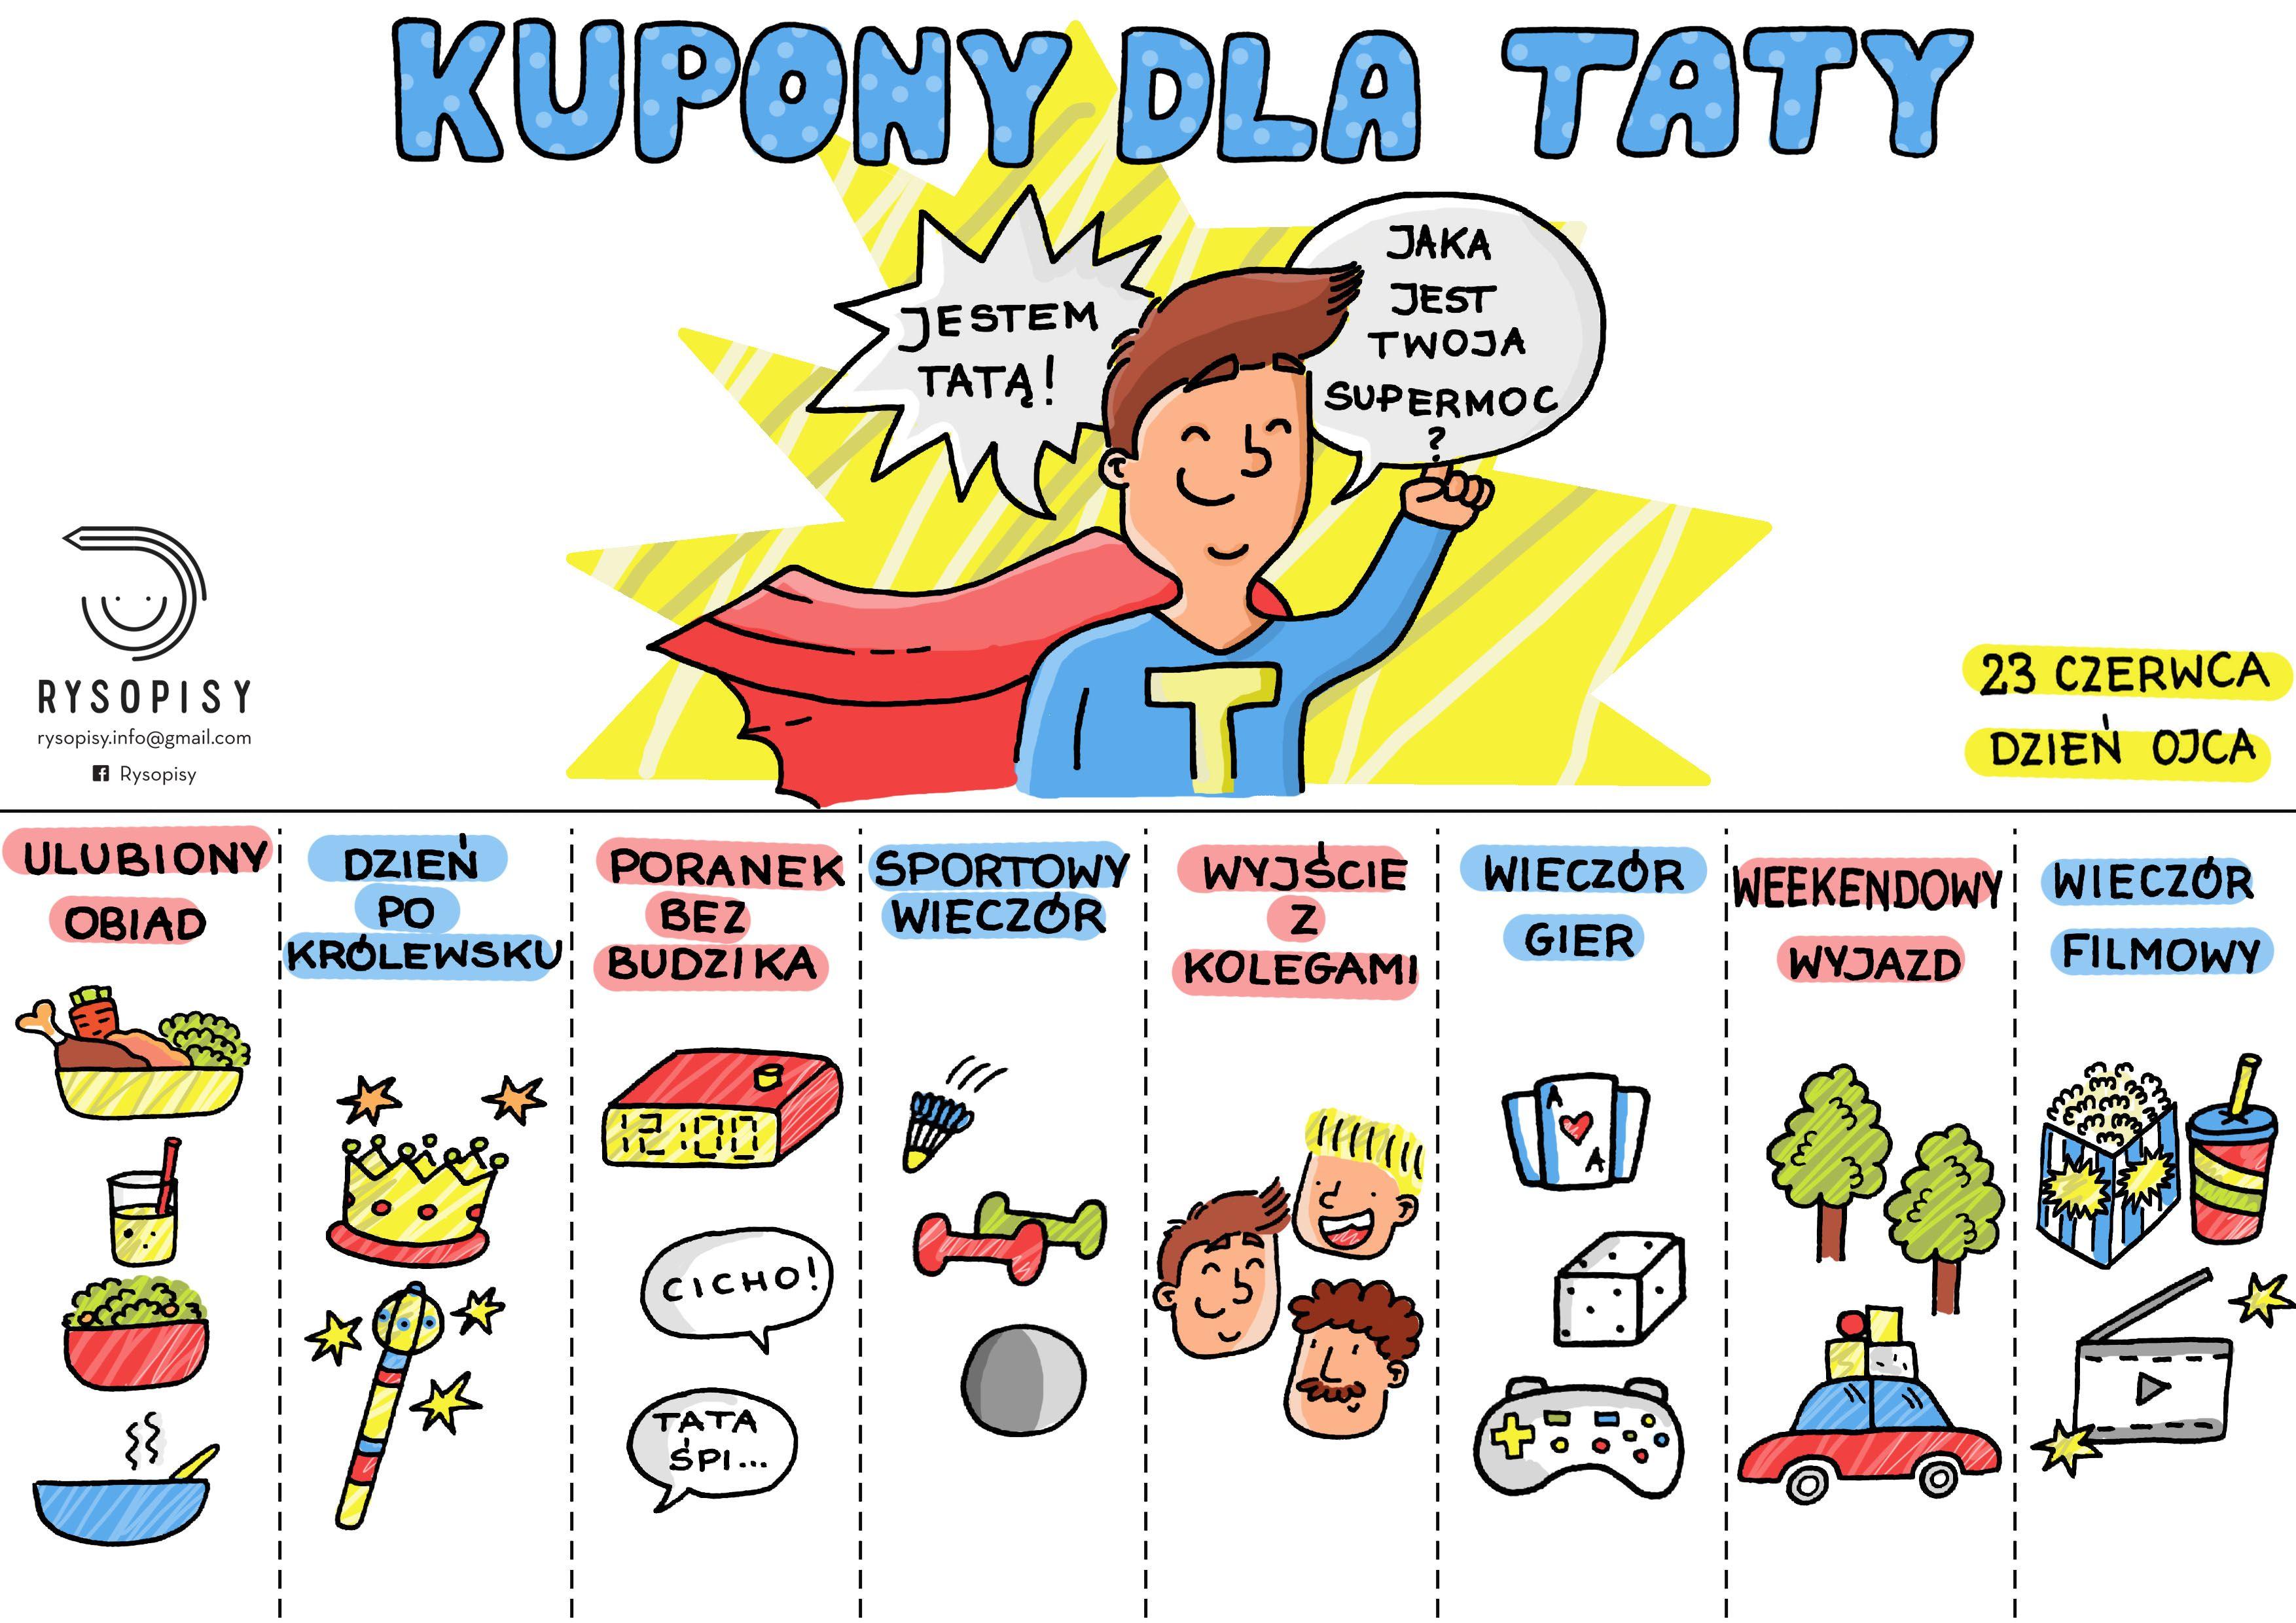 Kupony Dla Taty Rysopisy With Images Kupony Kupony Milosci